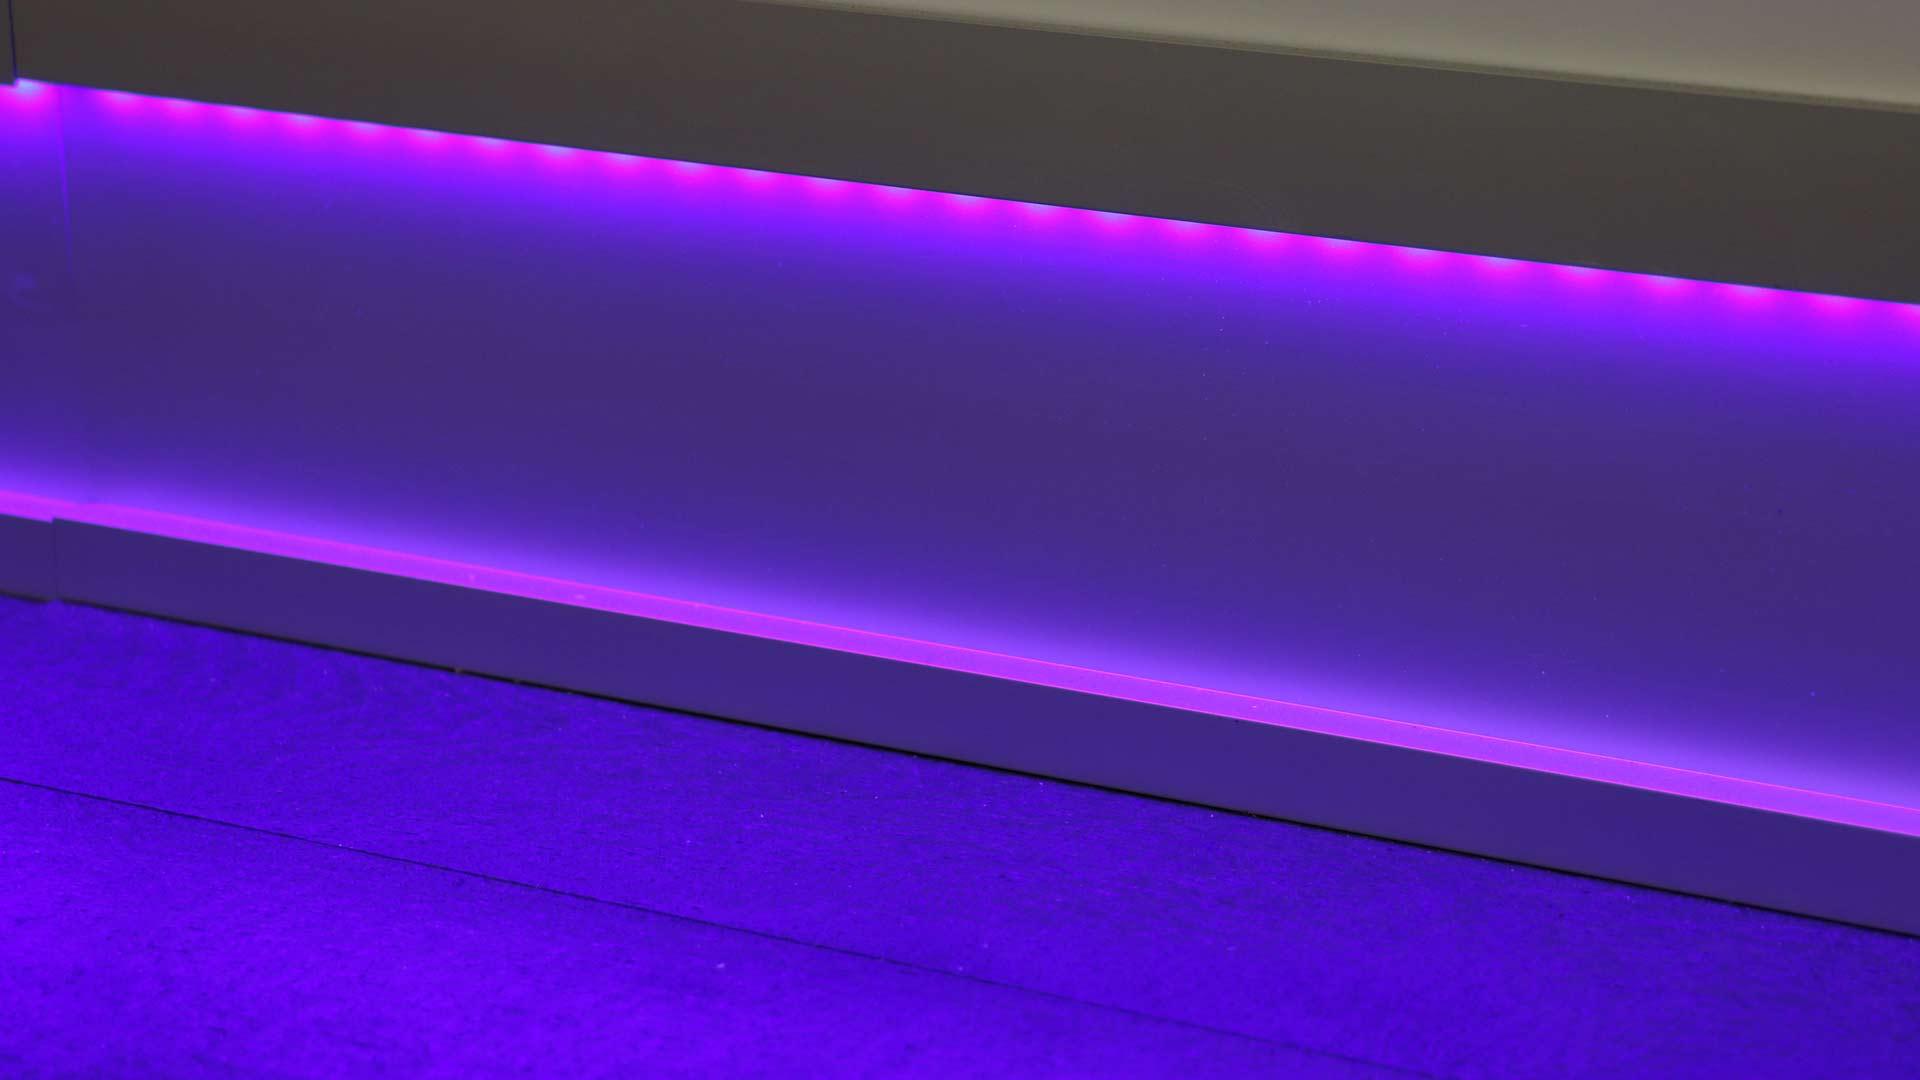 aluminum_baseboard_lightsHD